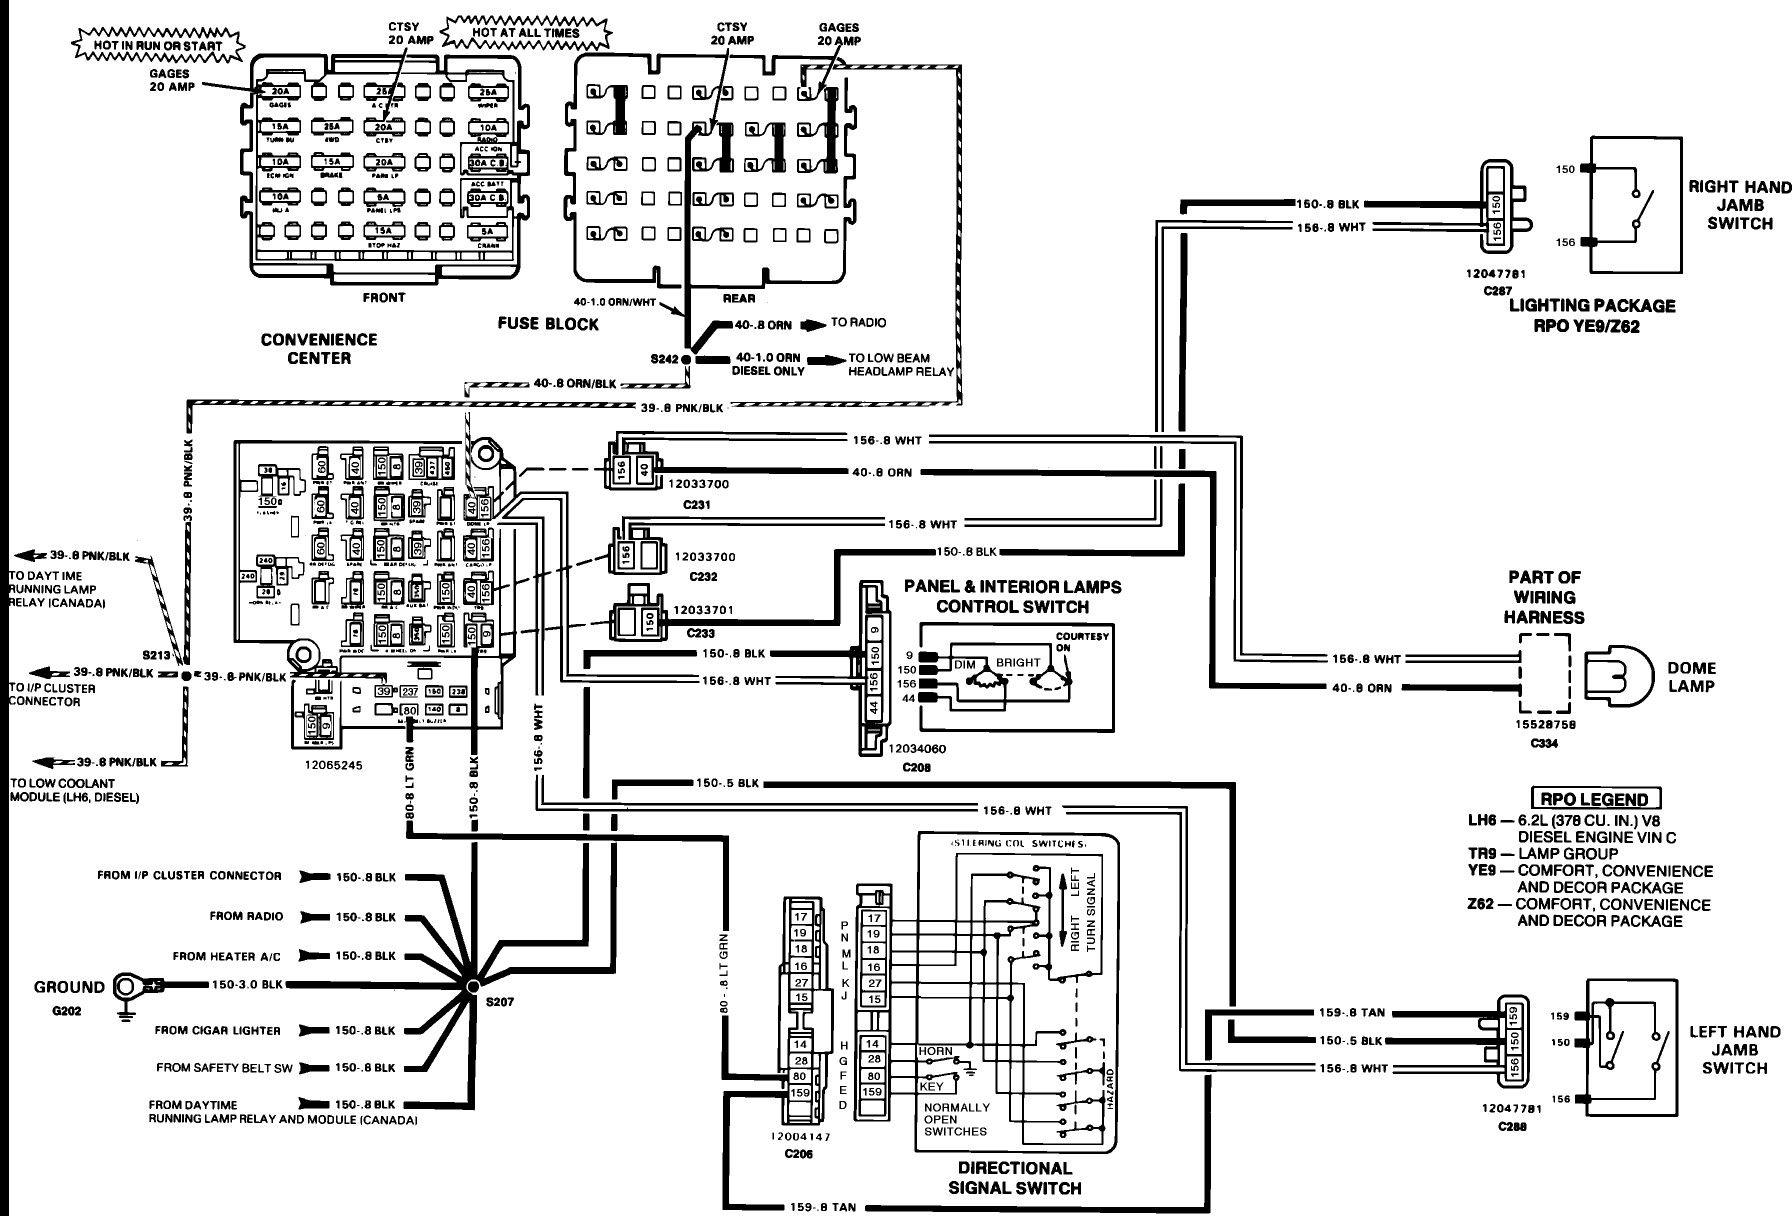 KT_7768] Wiring Diagram For A 1988 Chevy Truck Get Free Image About WiringWeasi Intel Monoc Iosco Bemua Mohammedshrine Librar Wiring 101